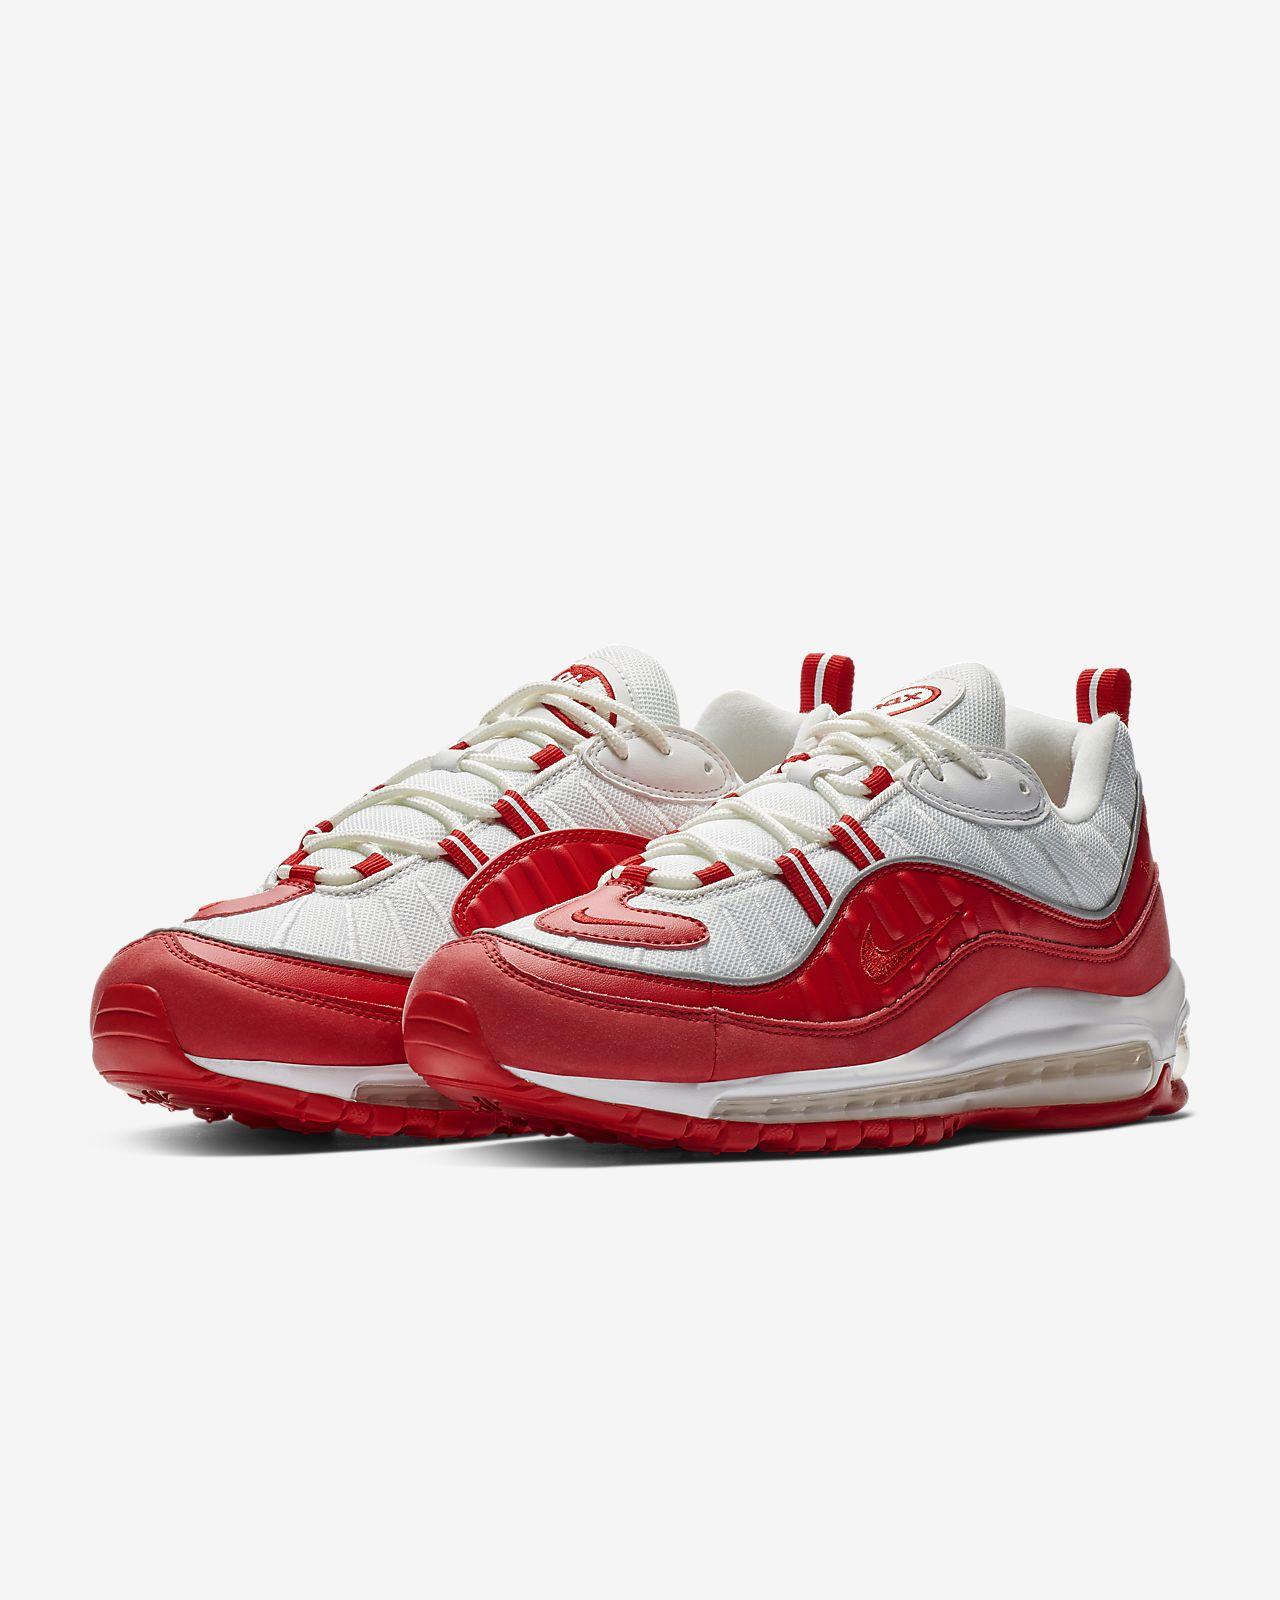 premium selection 03124 edf65 ... Nike Air Max 98 Men s Shoe